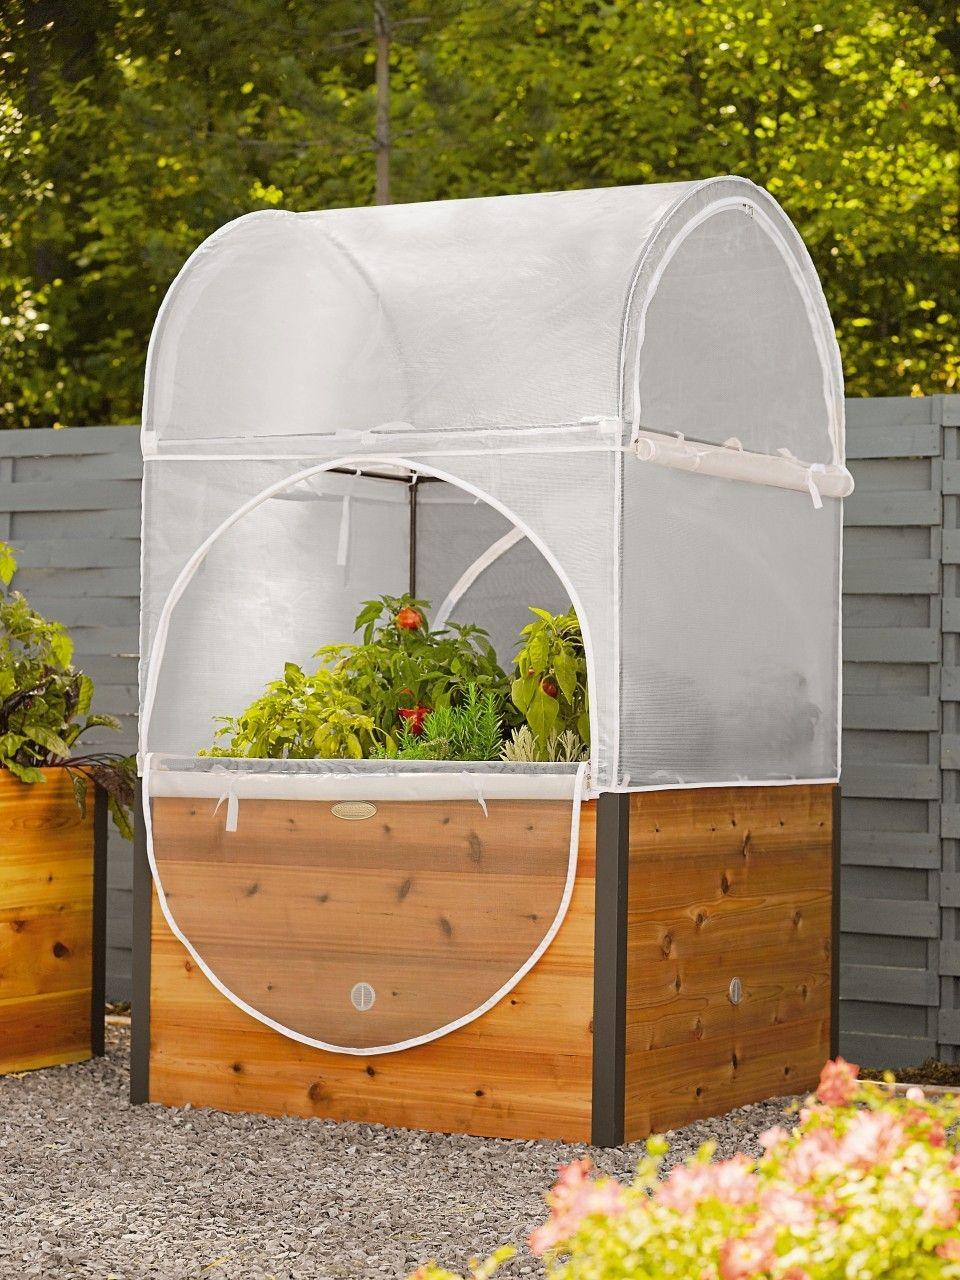 4X4 Elevated Garden Greenhouse, $399.00   Vegetable garden ...